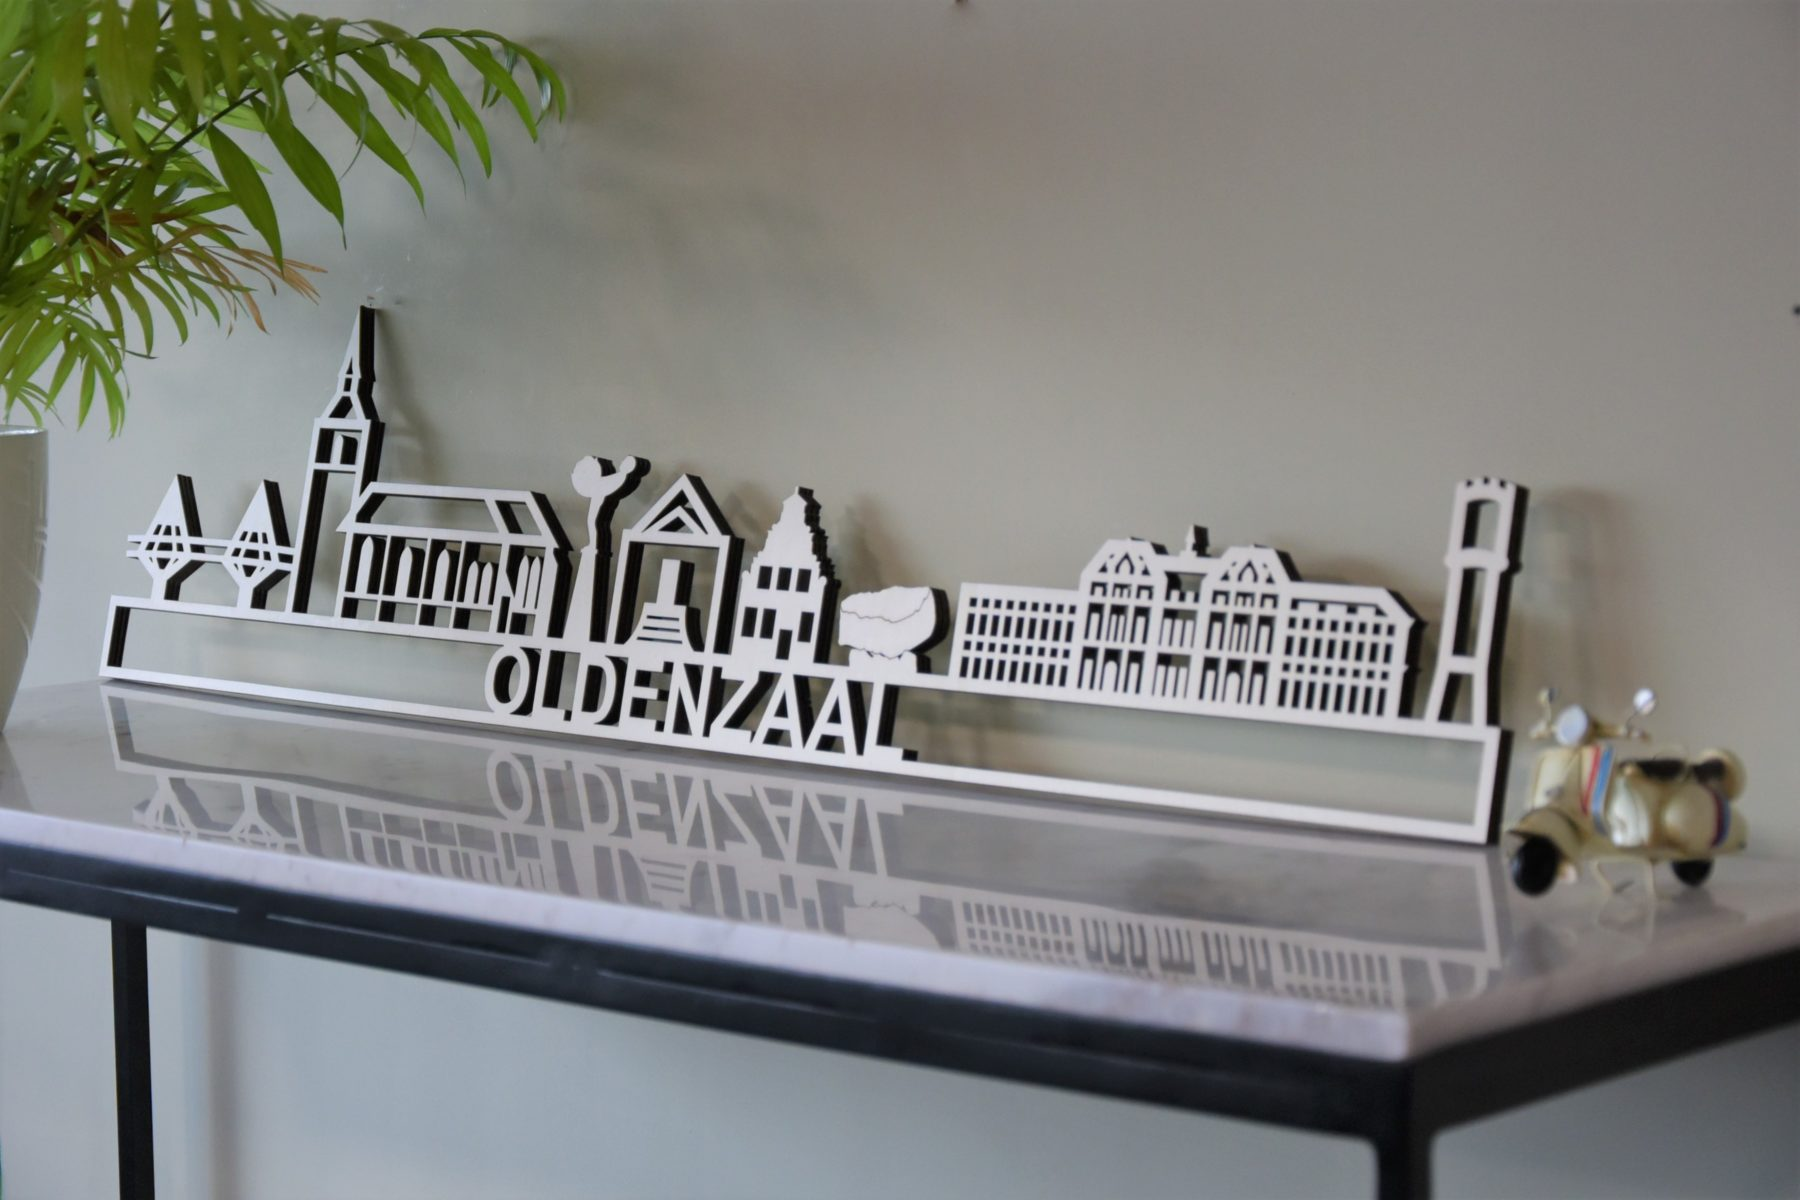 Skyline Oldenzaal hout populier